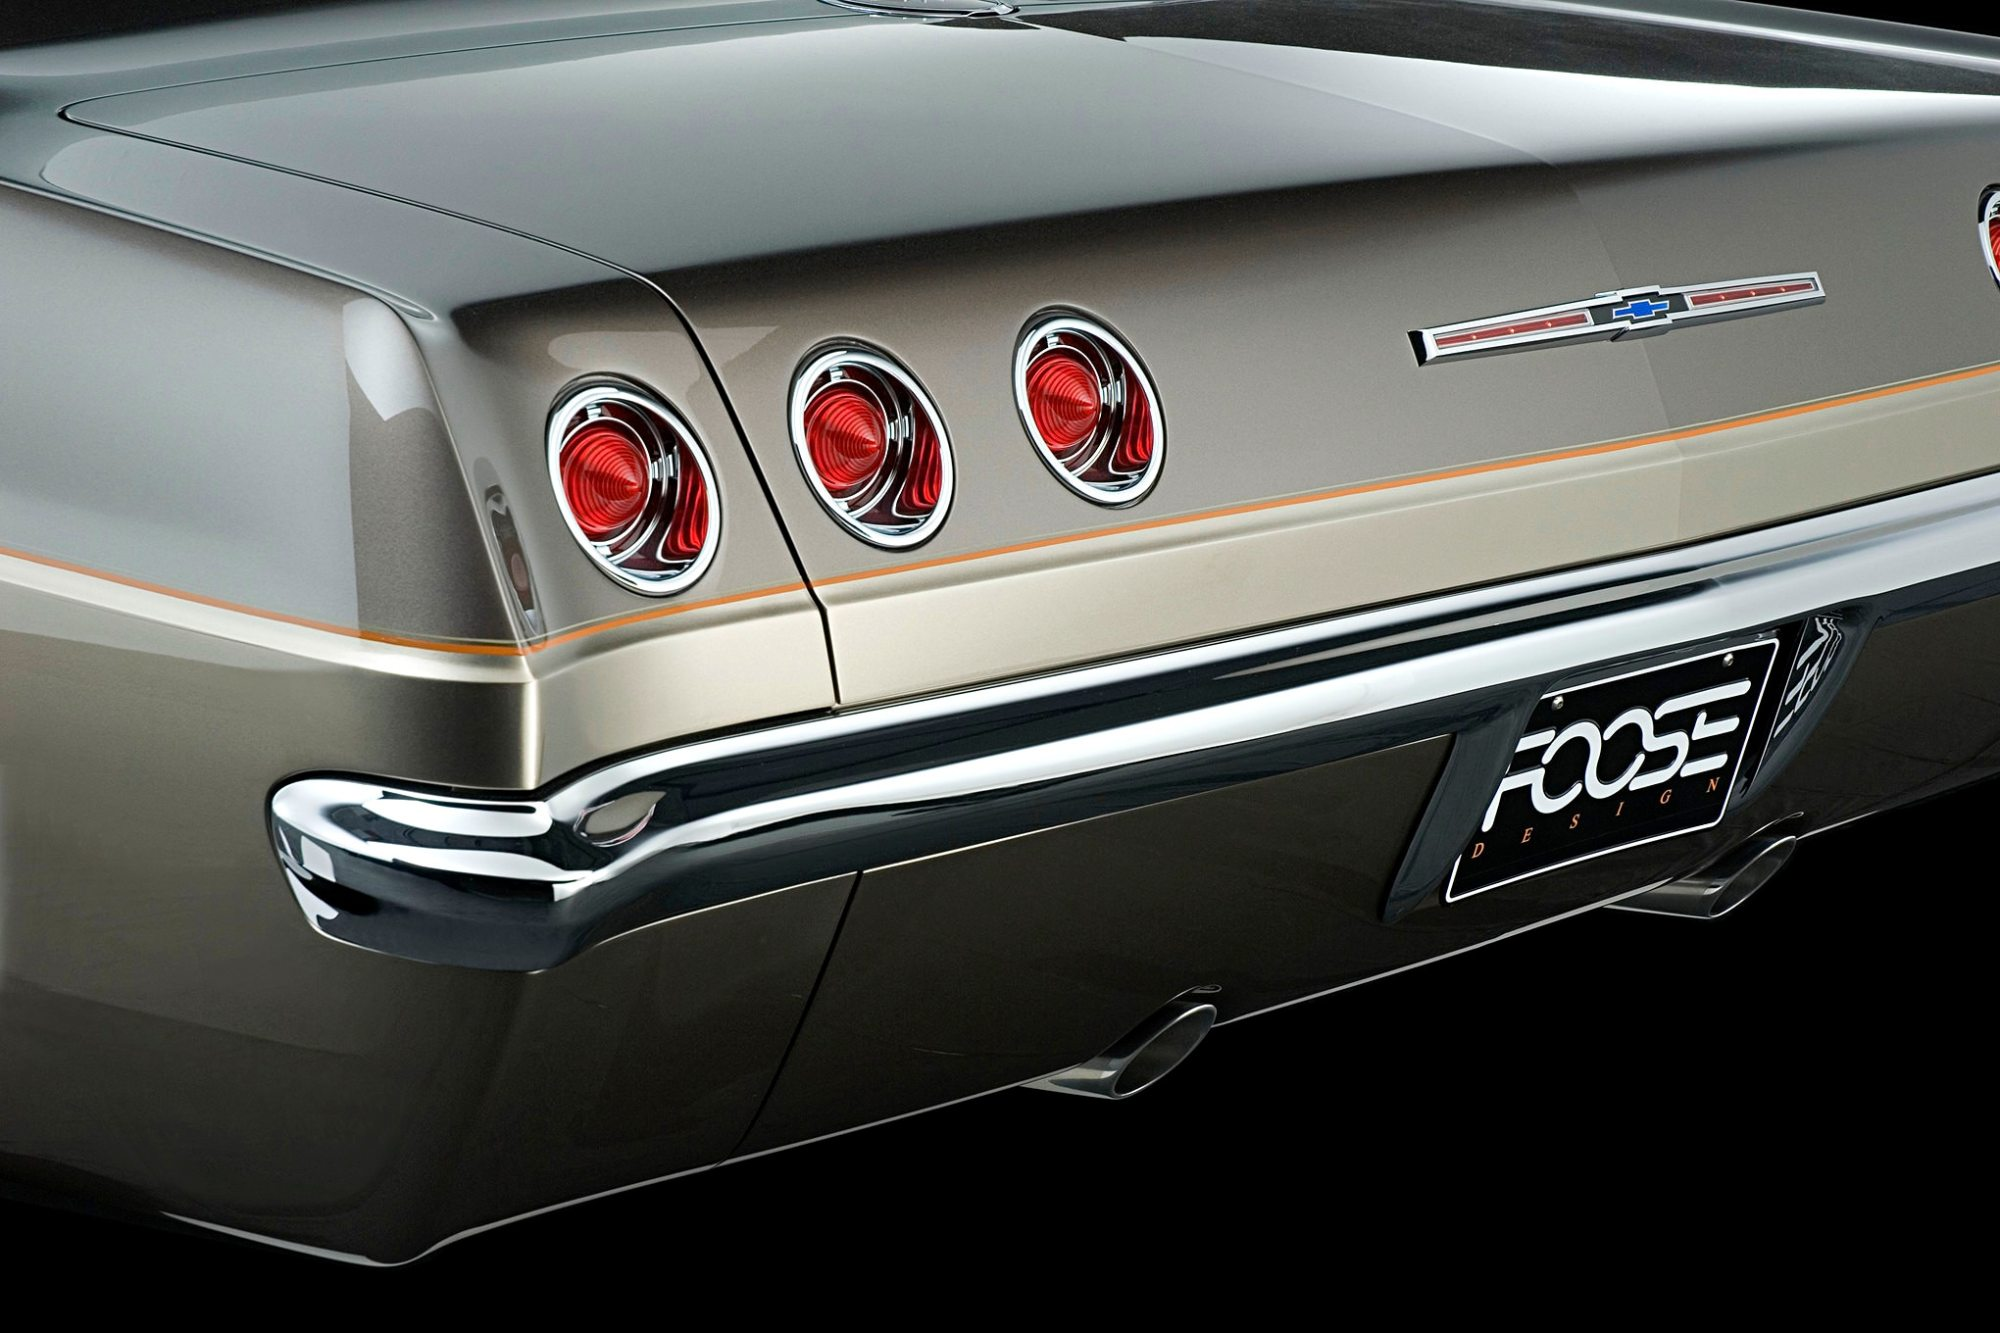 hight resolution of 1965 chevrolet impala taillight alt